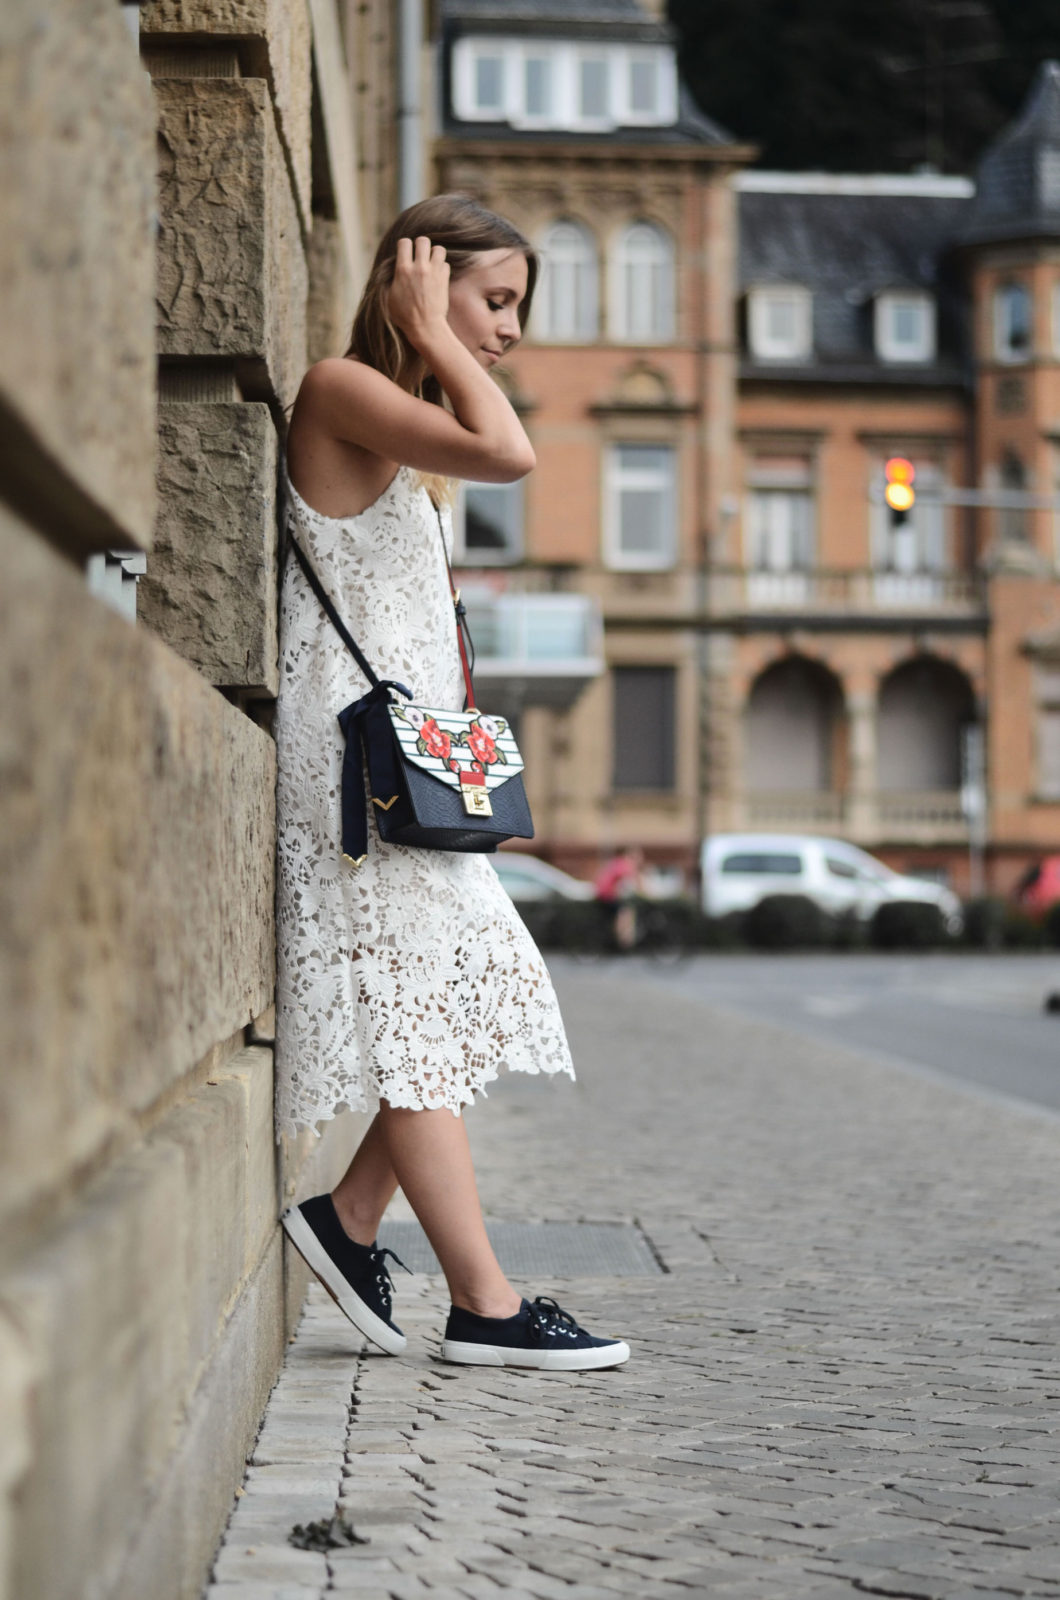 Sariety-modeblog-heidelberg-sarah-czok-fashionblogger-zara-spitzenkleid-superga-aldo-bag-6